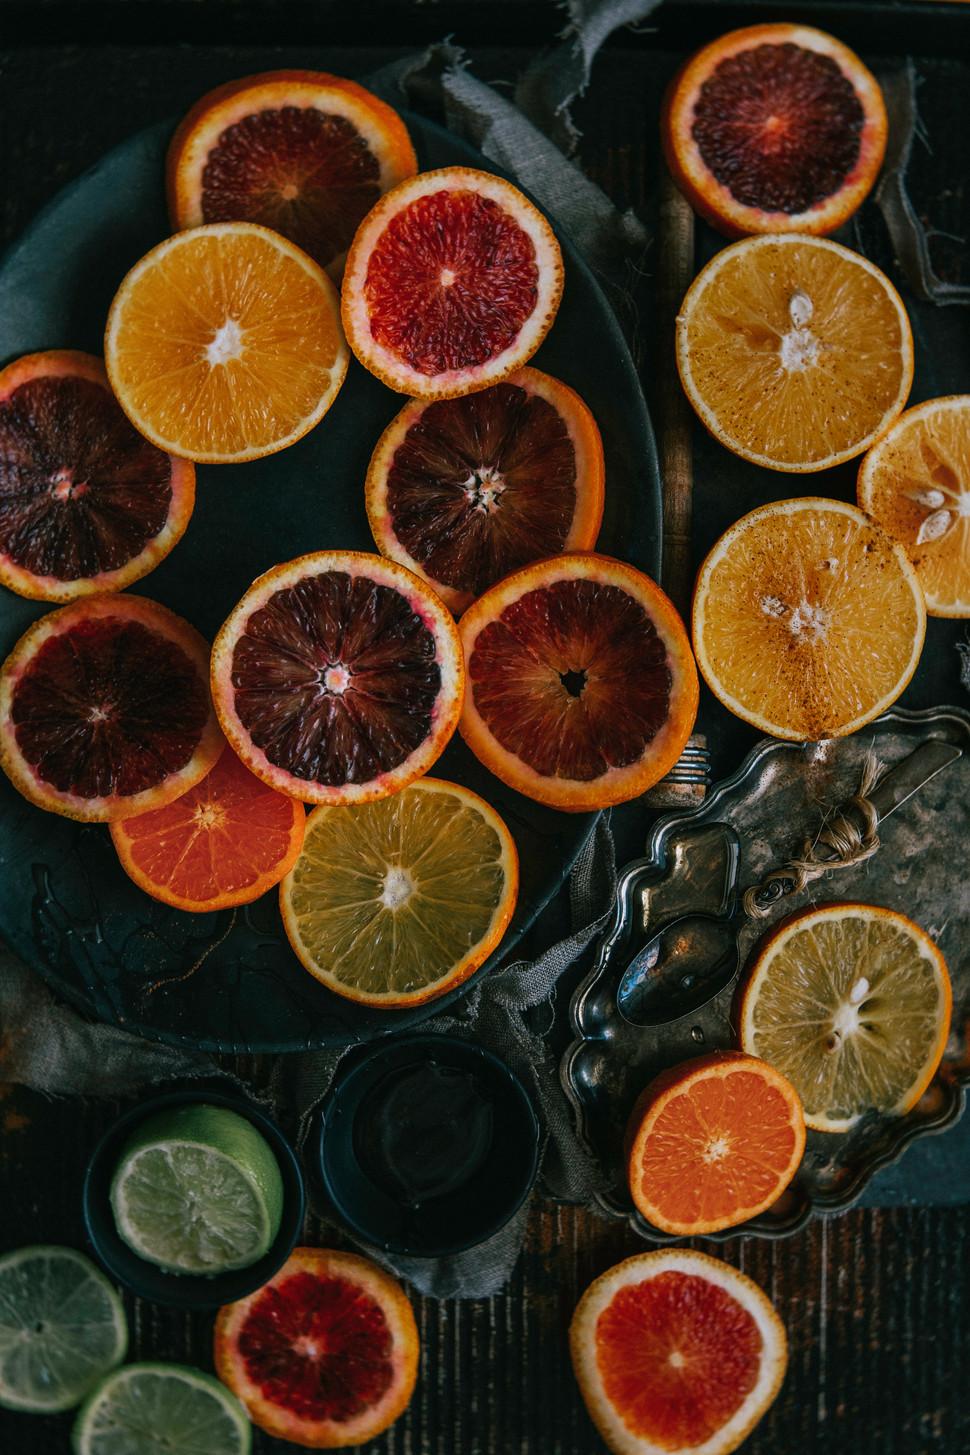 Hollie_Jeakins_Food_Photograhy_Citrus.jpg